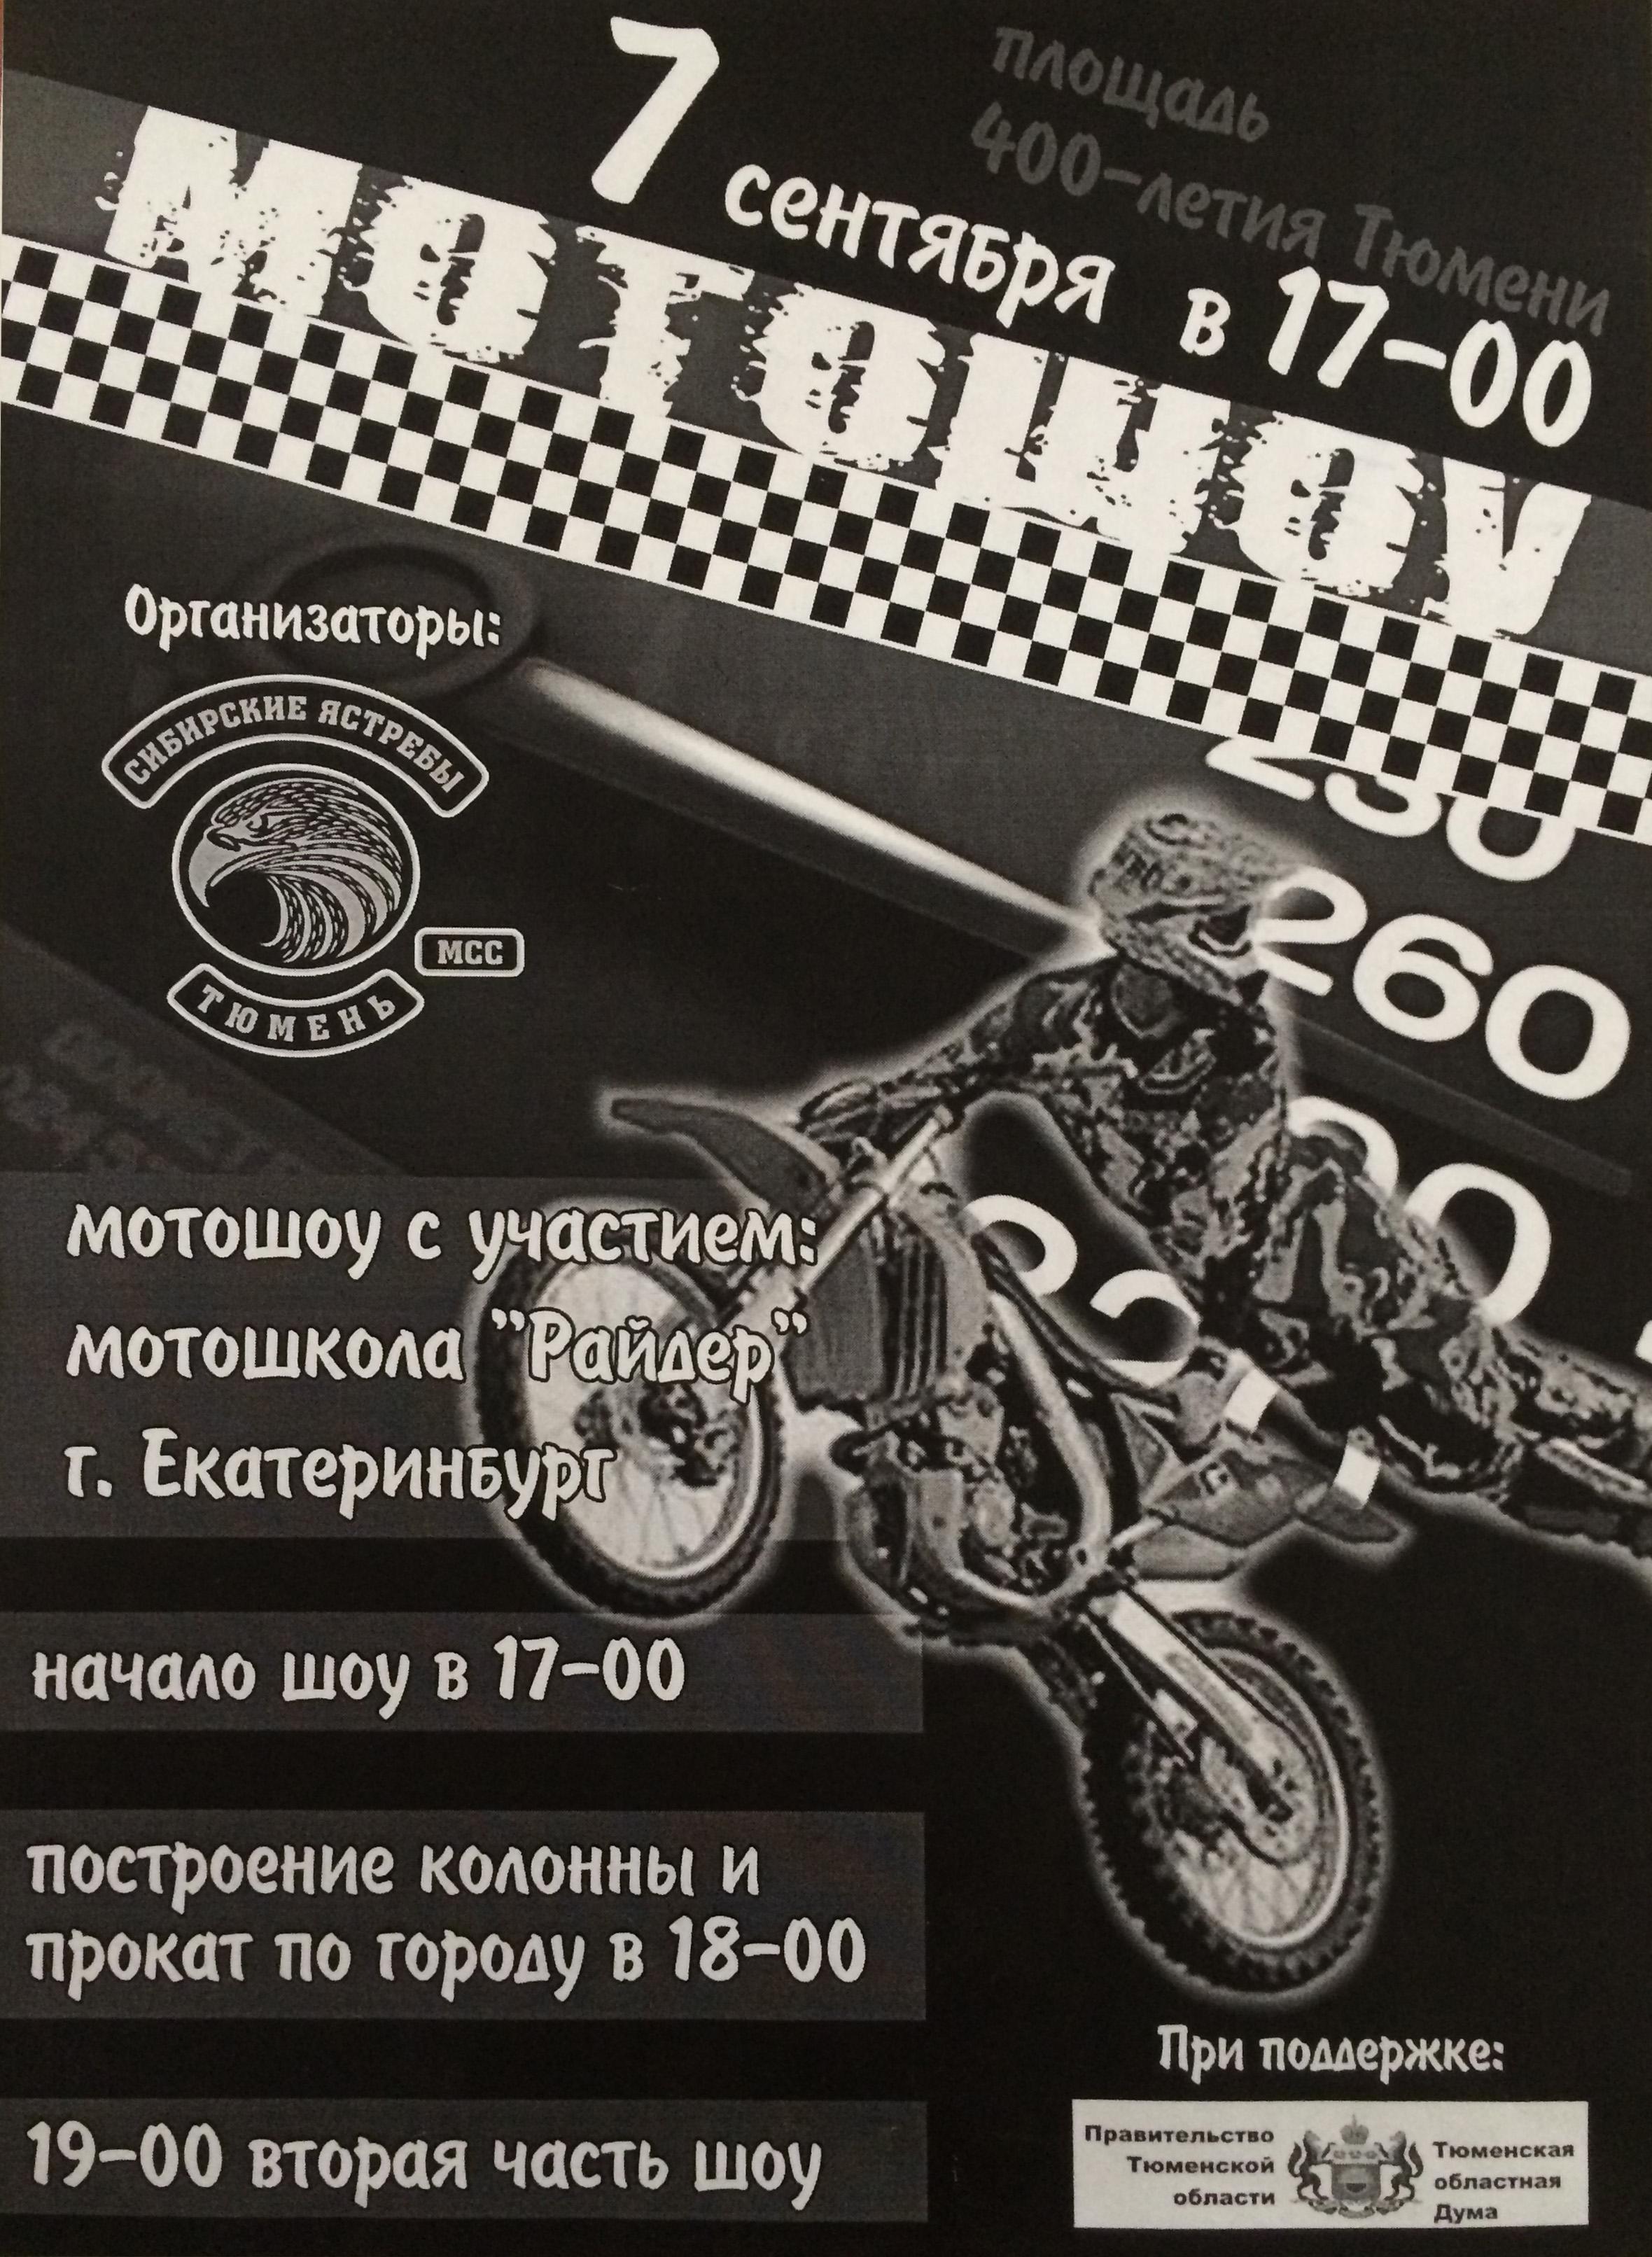 Мотобалет и прыжки на мотоциклах - в центре Тюмени 2